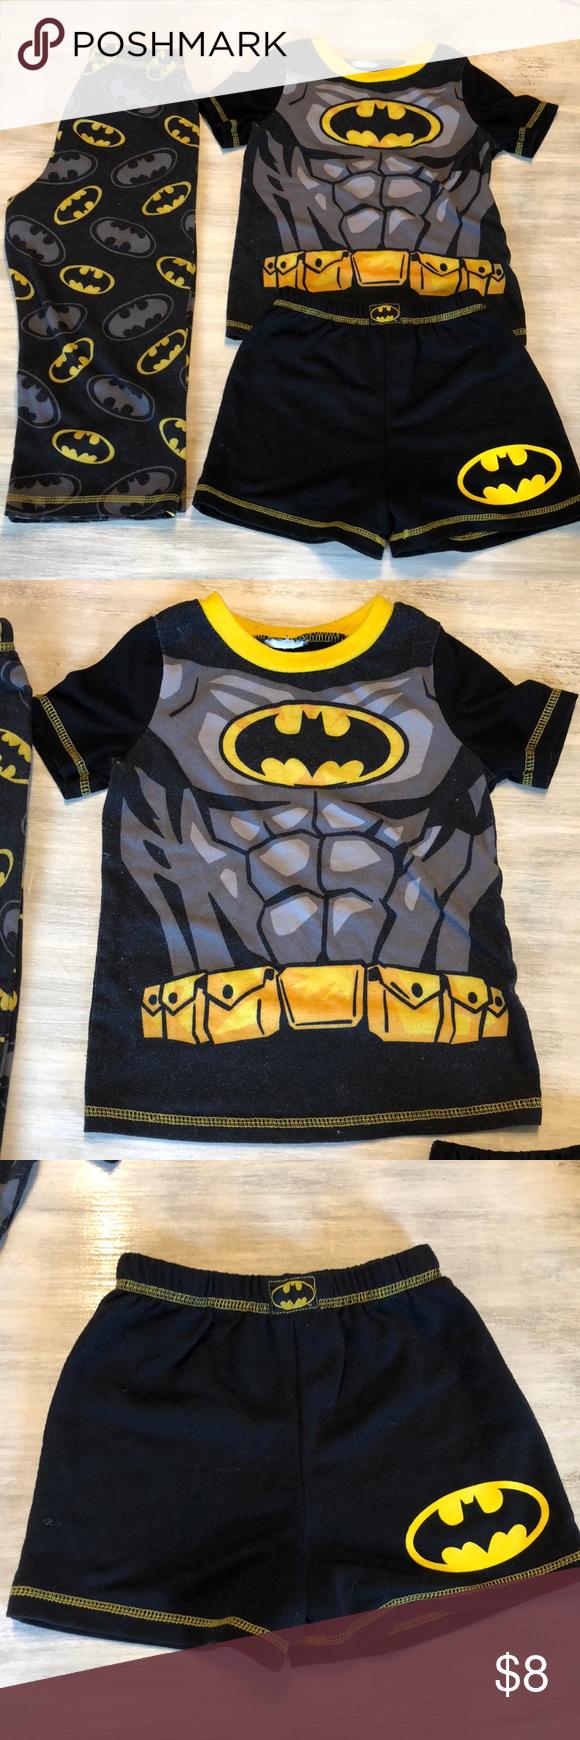 🐛Boys 4T Batman Superhero Pajamas 3 Piece set 🦇 3 Piece Boys Batman  Pajamas Set da364afe1